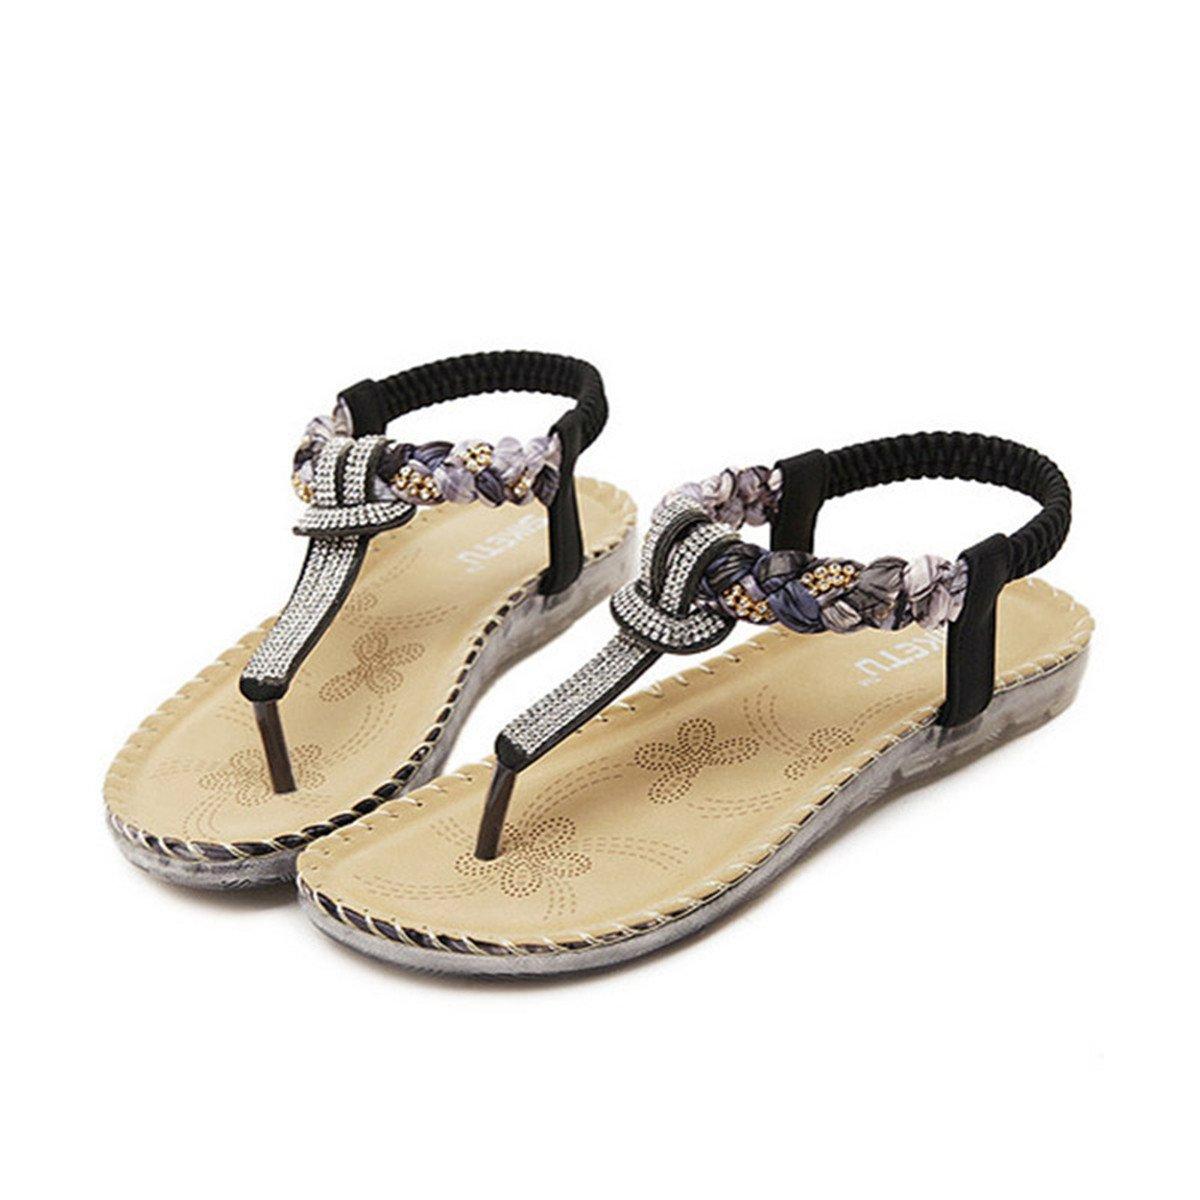 ffb5b4f239365 gracosy Women's Sandals Summer Beach Flat Gladiator Strappy Sandals Flip  Flops Shoe Roman Open Toe Boho Thongs Sandal Ladies Ankle Strap Outdoor  Anti ...